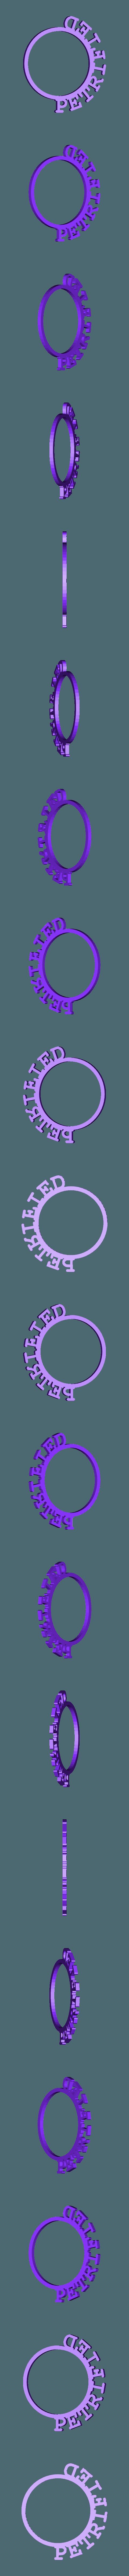 LRingPetrified.stl Download STL file D&D Condition Rings • 3D printable design, Jinja